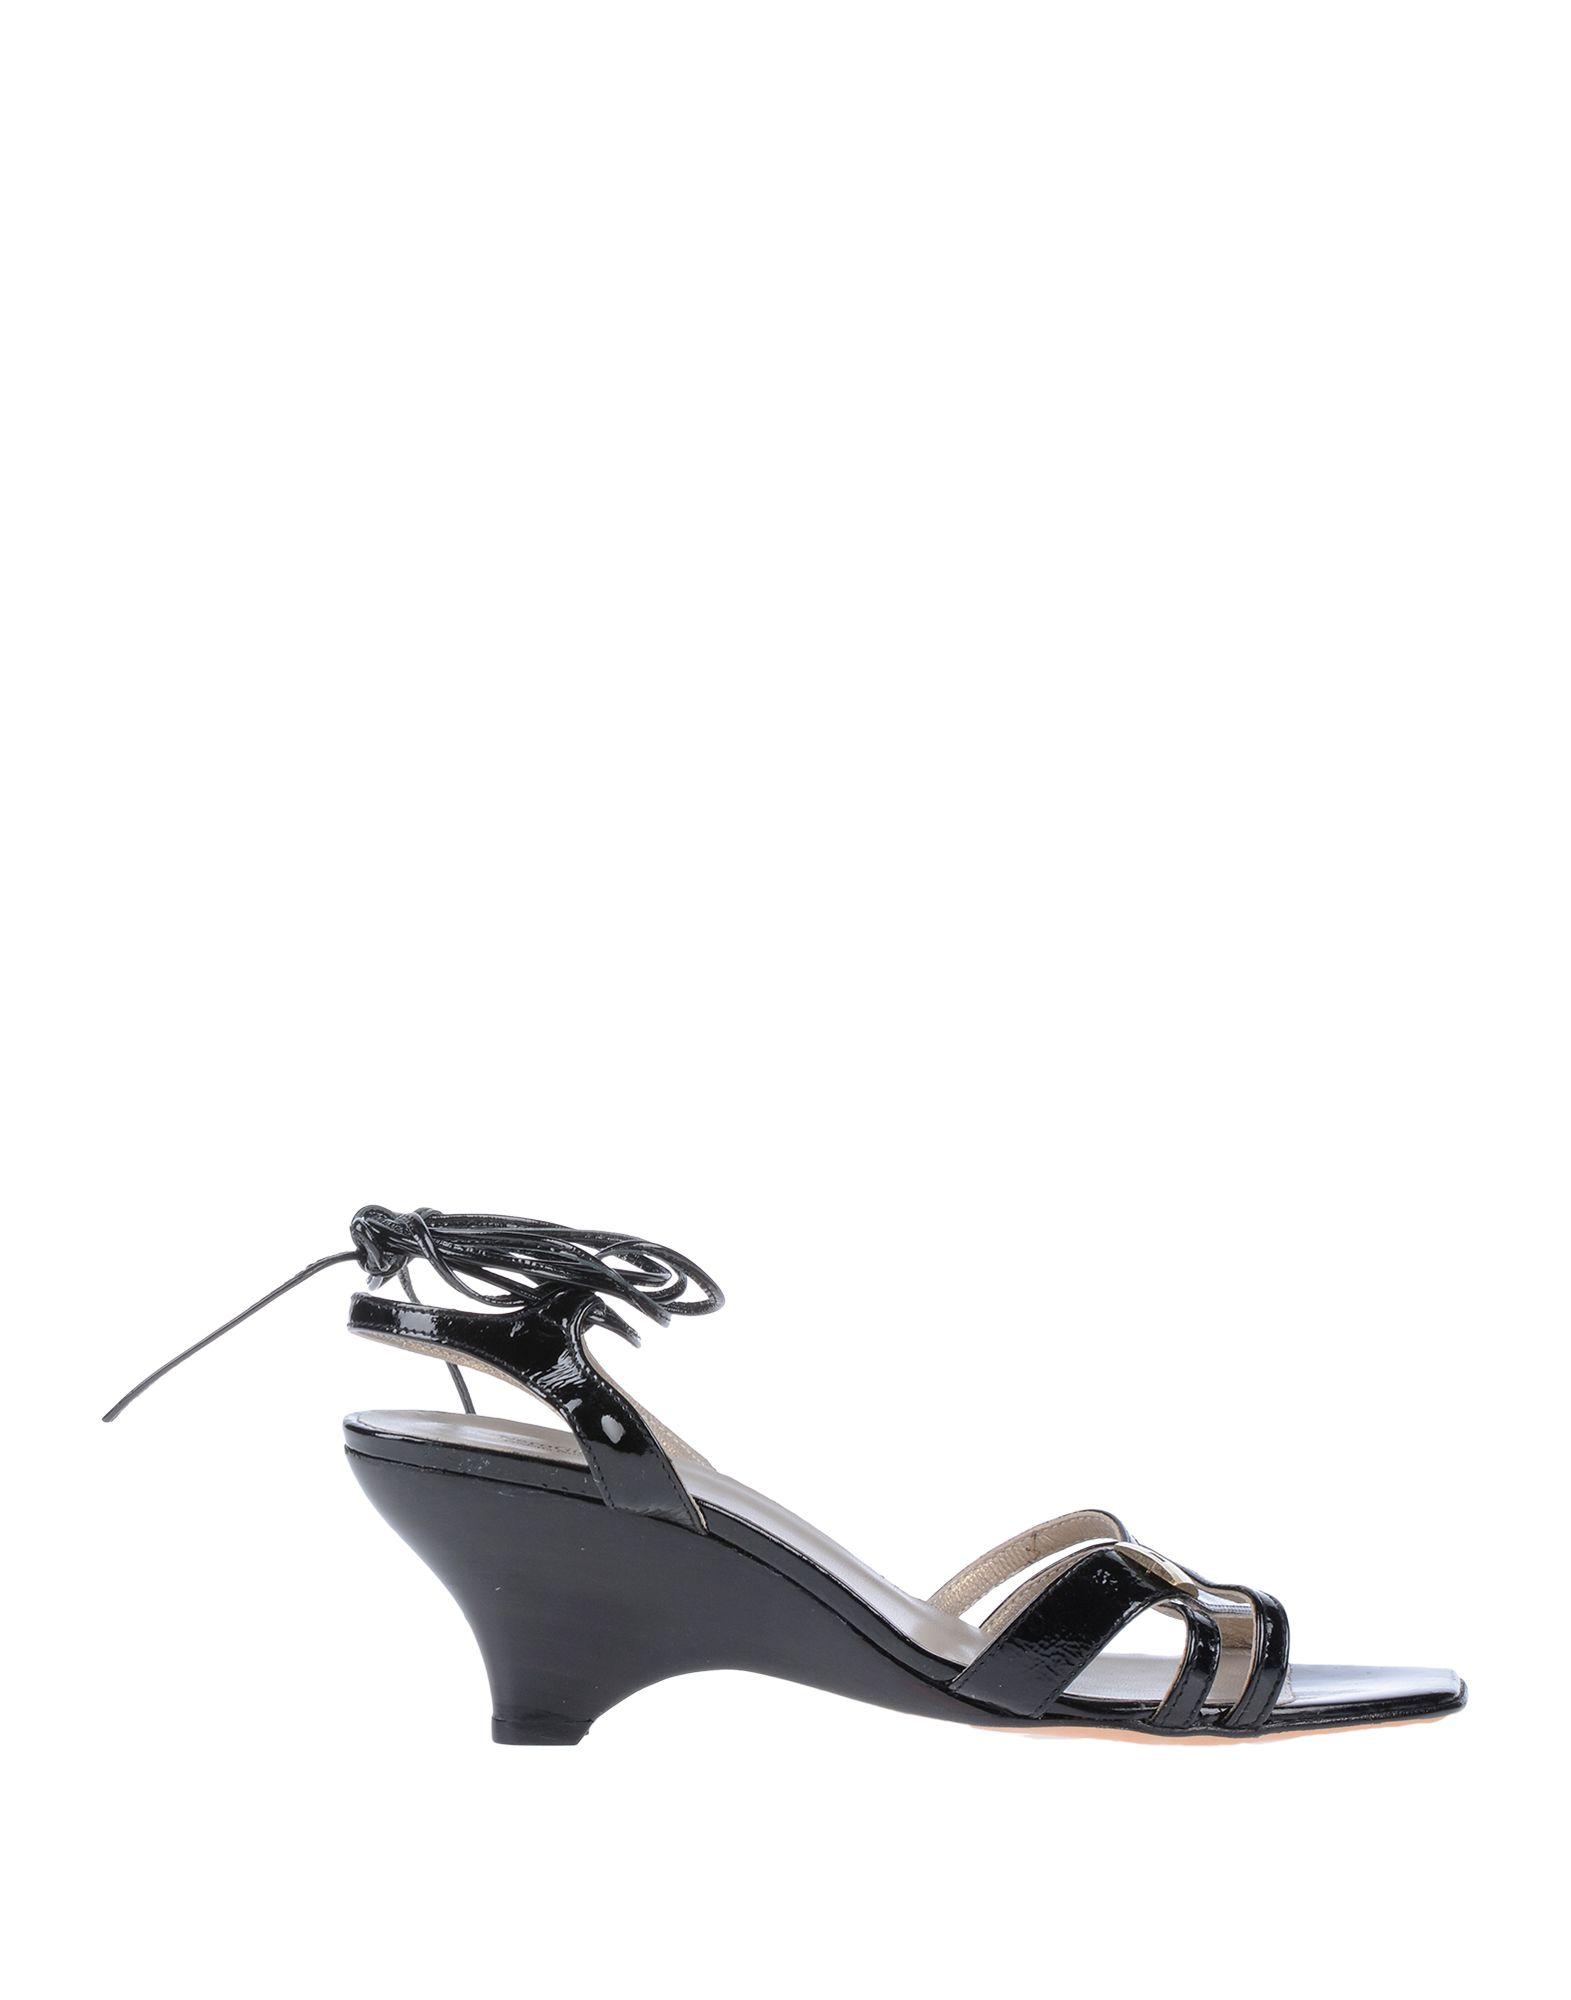 Nero on Giardini Sandals - Women Nero Giardini Sandals online on Nero  Australia - 11522405DP 55a8f9